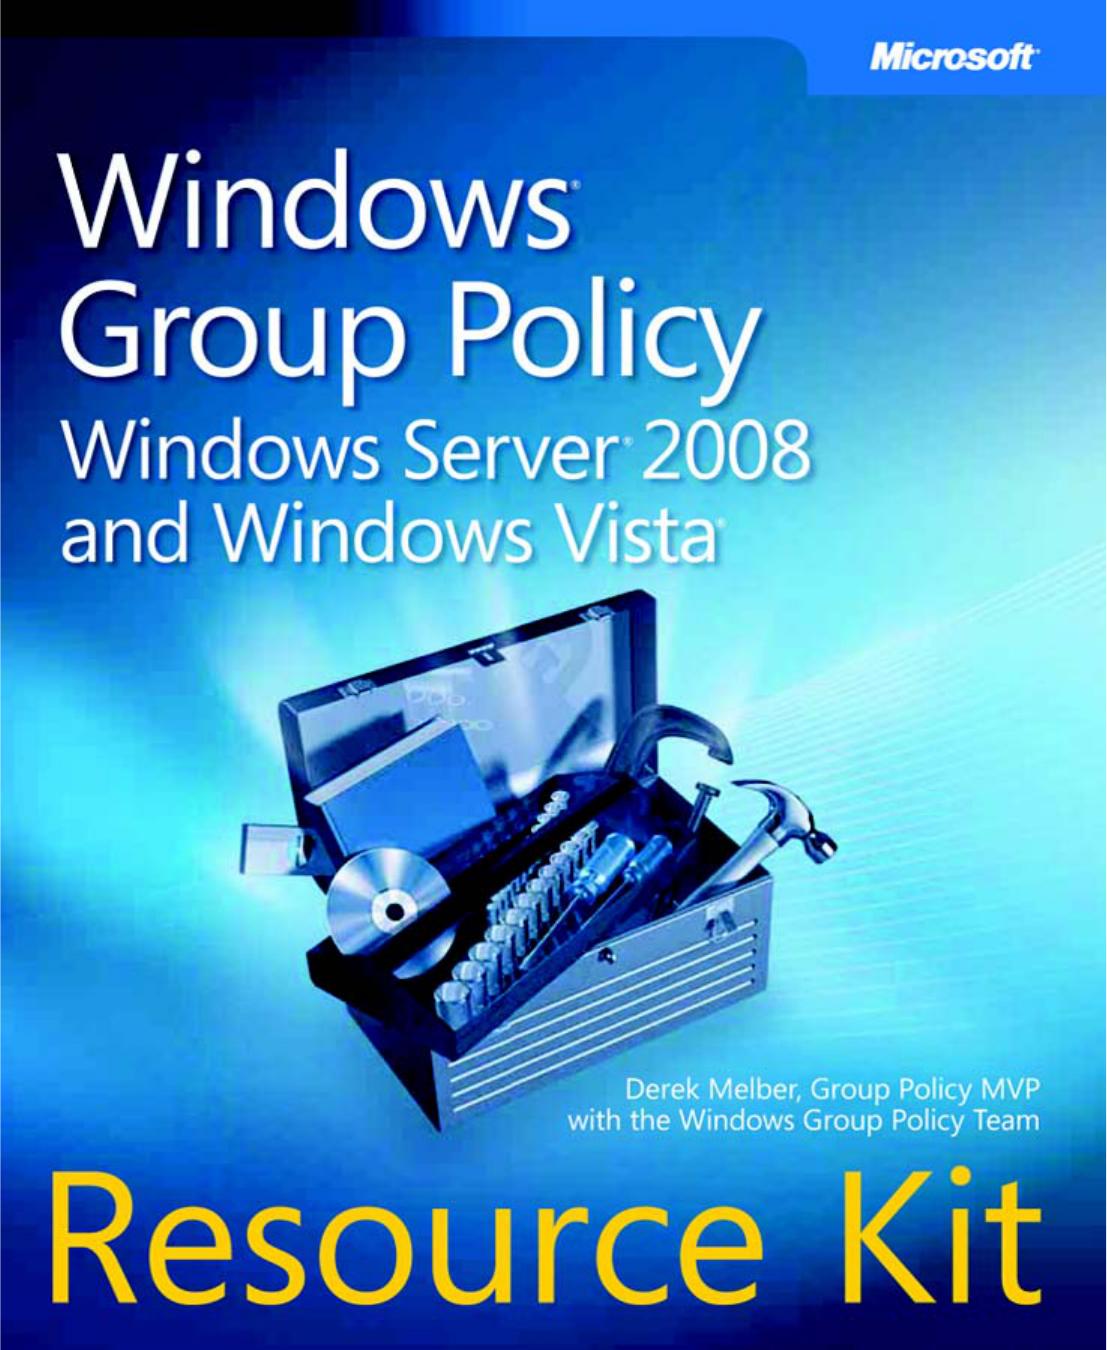 Windows Group Policy Resource Kit | manualzz com